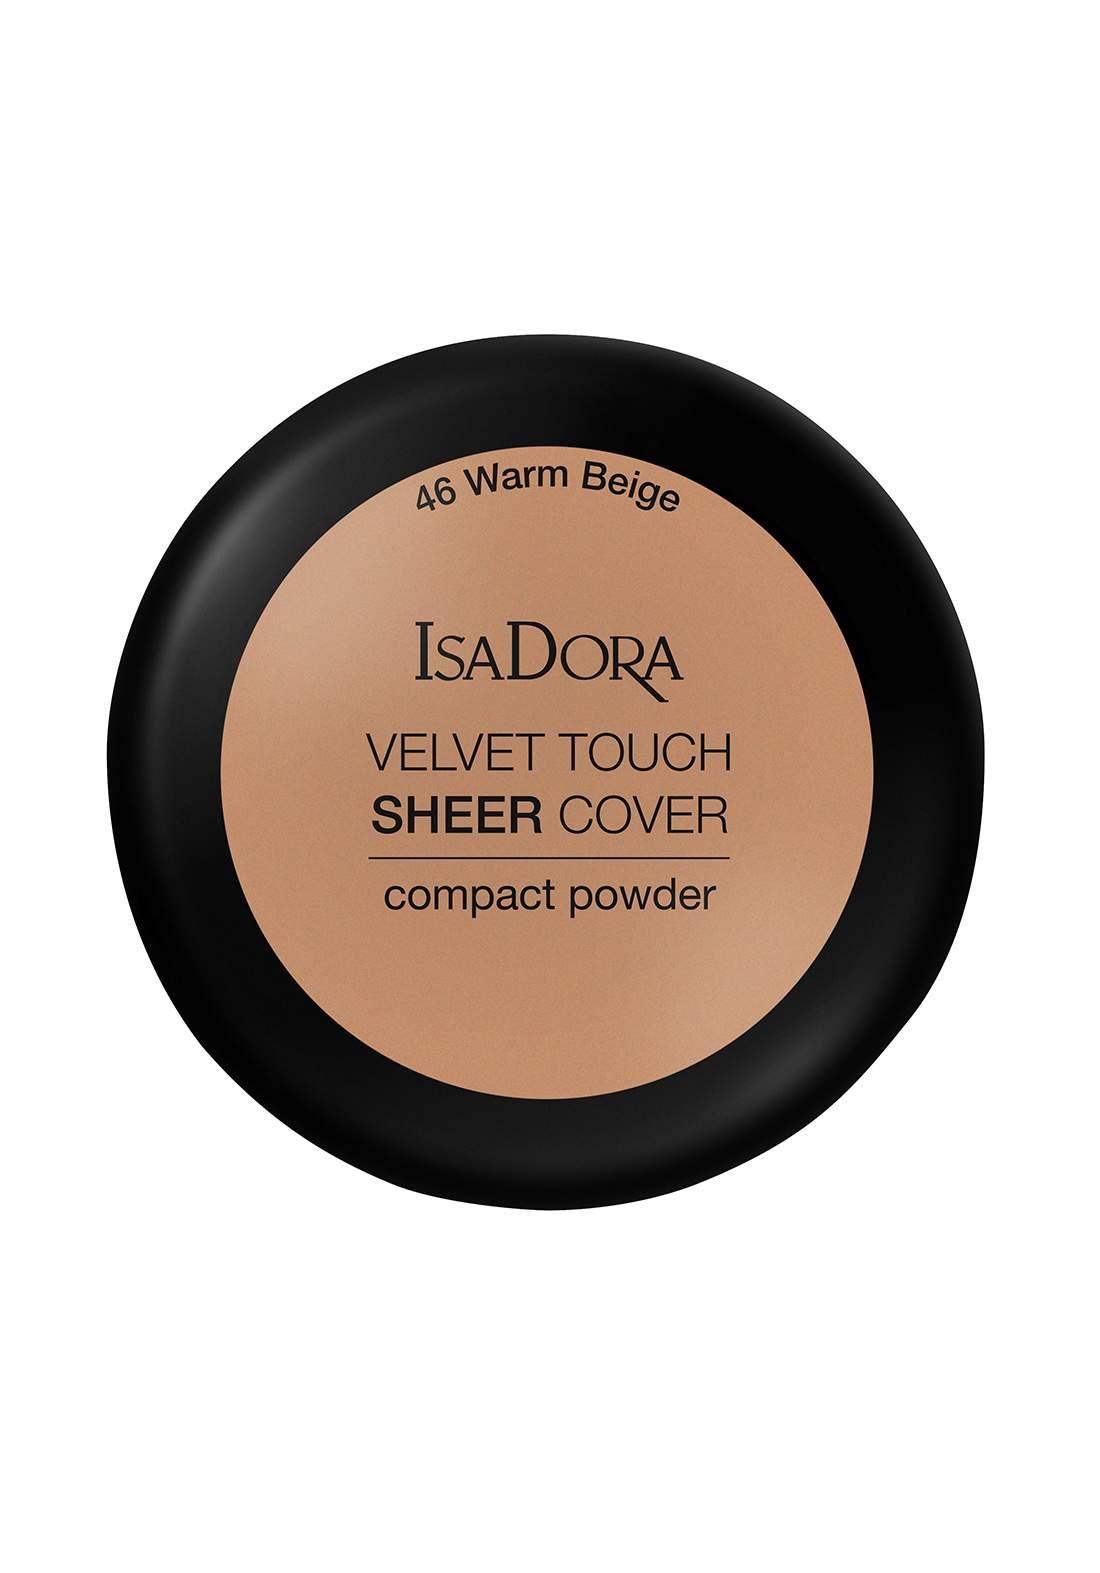 IsaDora 317110 Velvet Touch Sheer Cover Compact Powder Warm Beige NO.46 بودرة